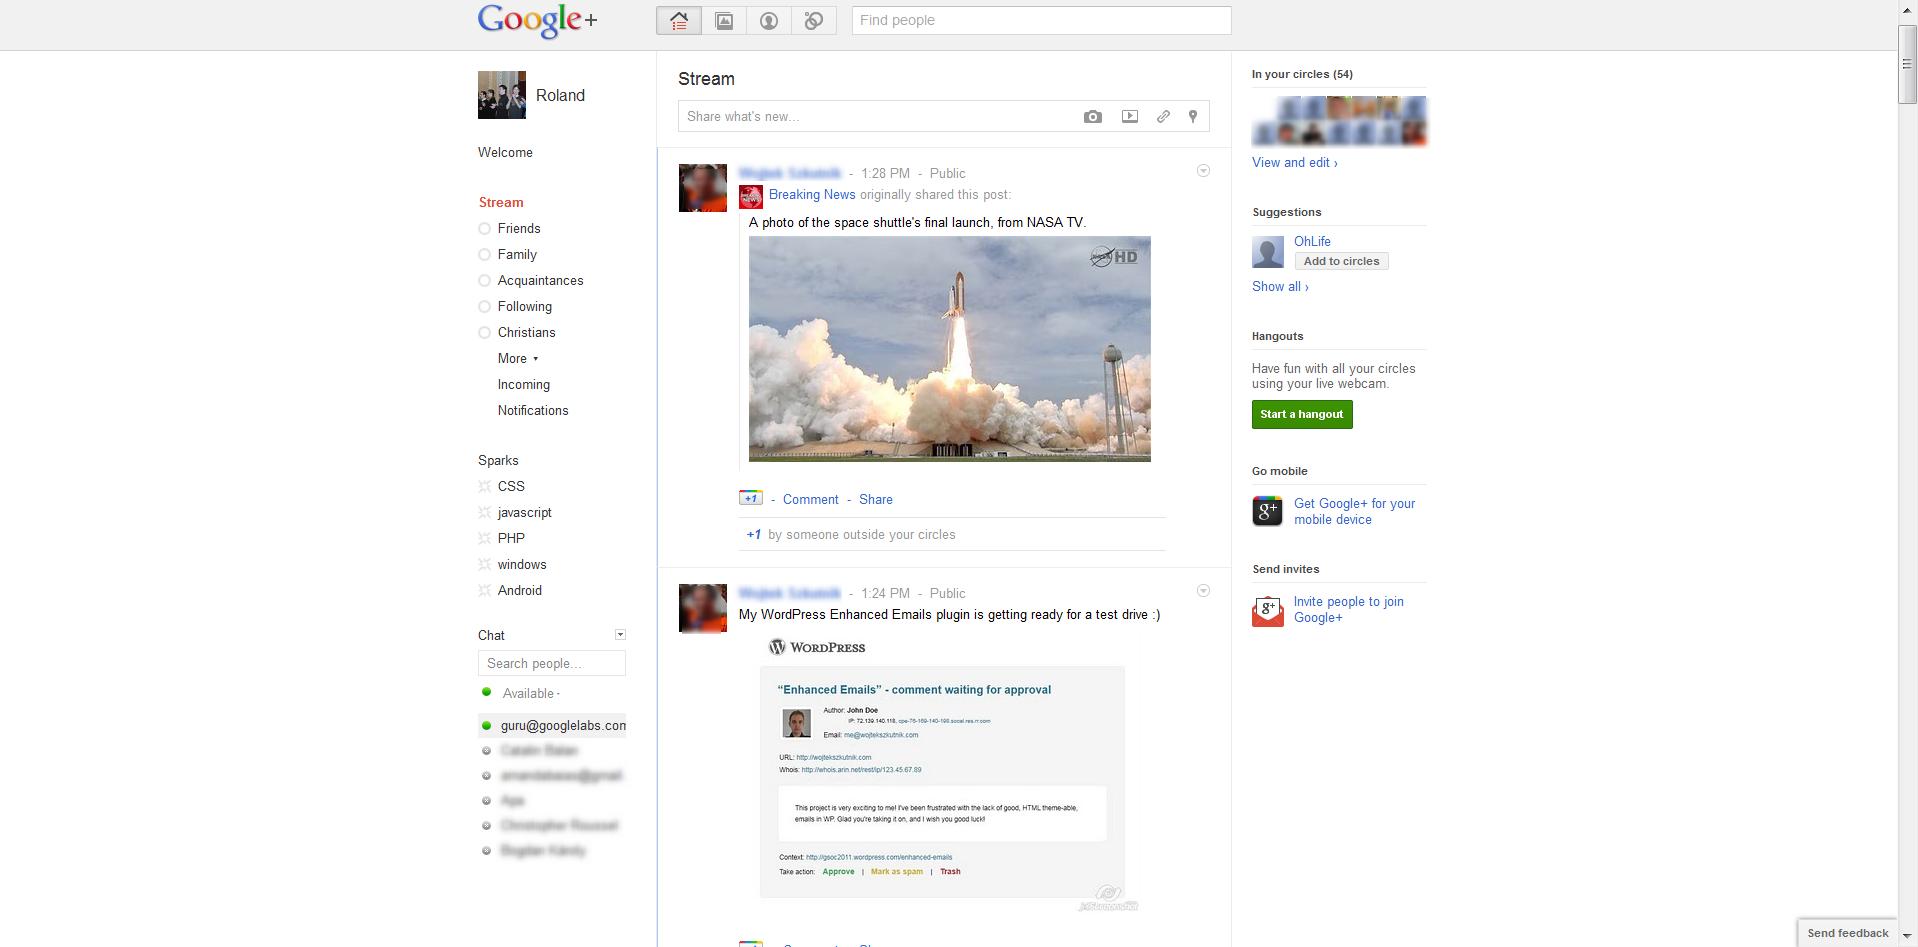 Google+ Main Page